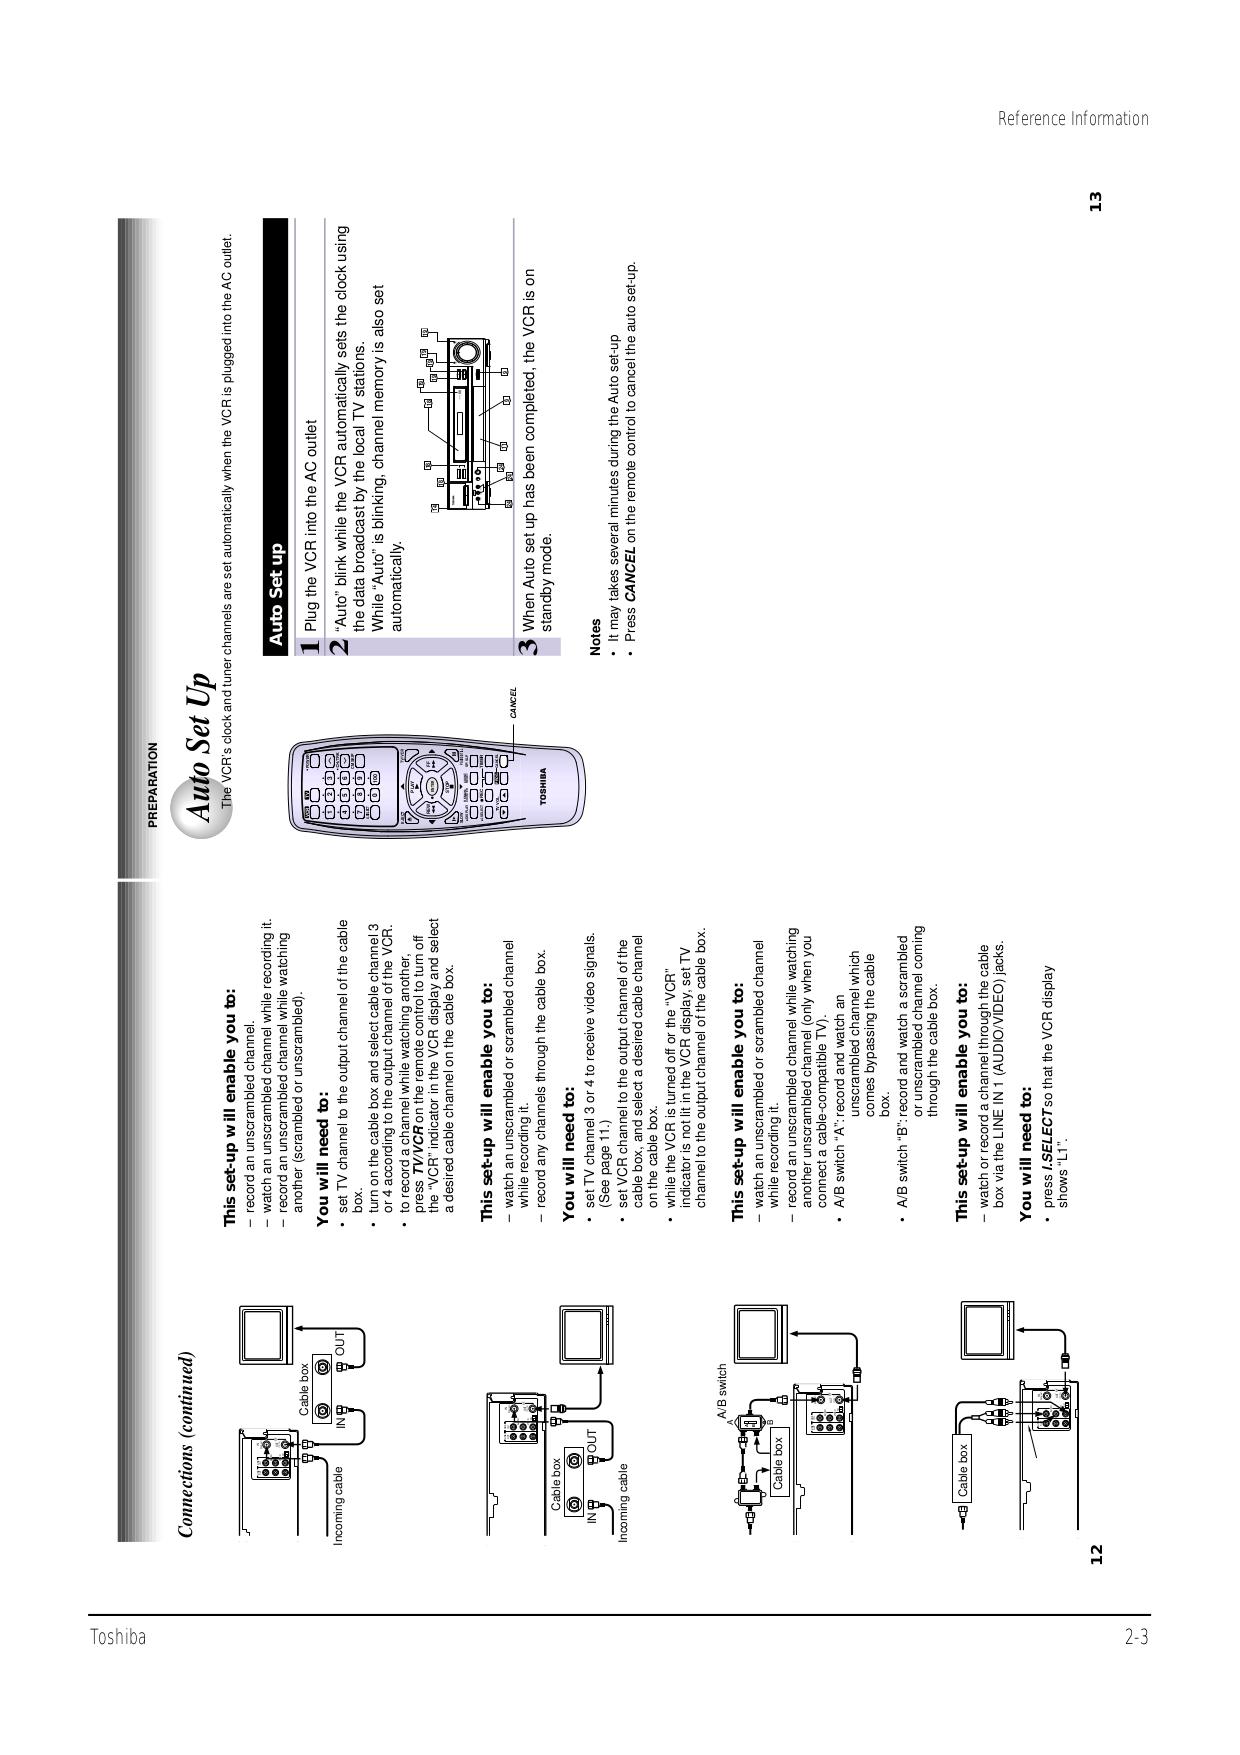 PDF manual for Toshiba VCR W522